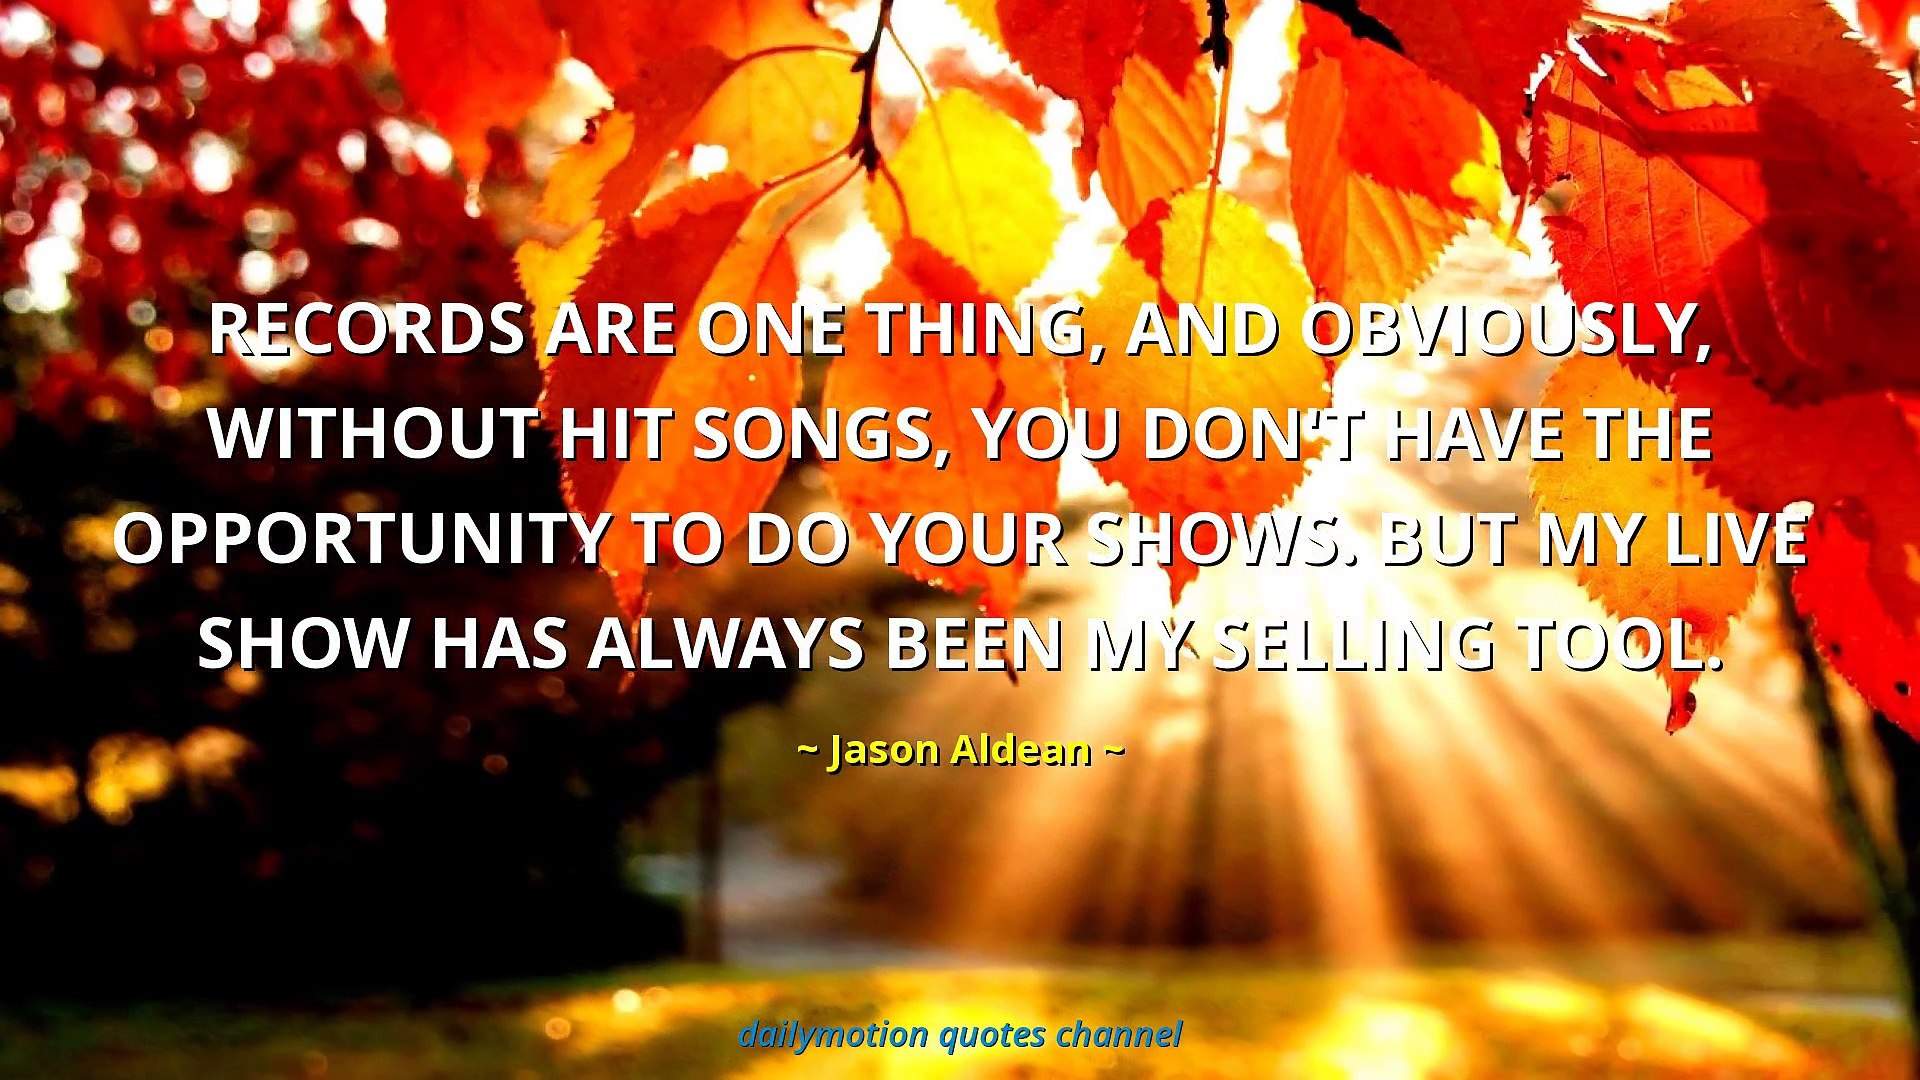 Jason Aldean Quotes #3 - video dailymotion